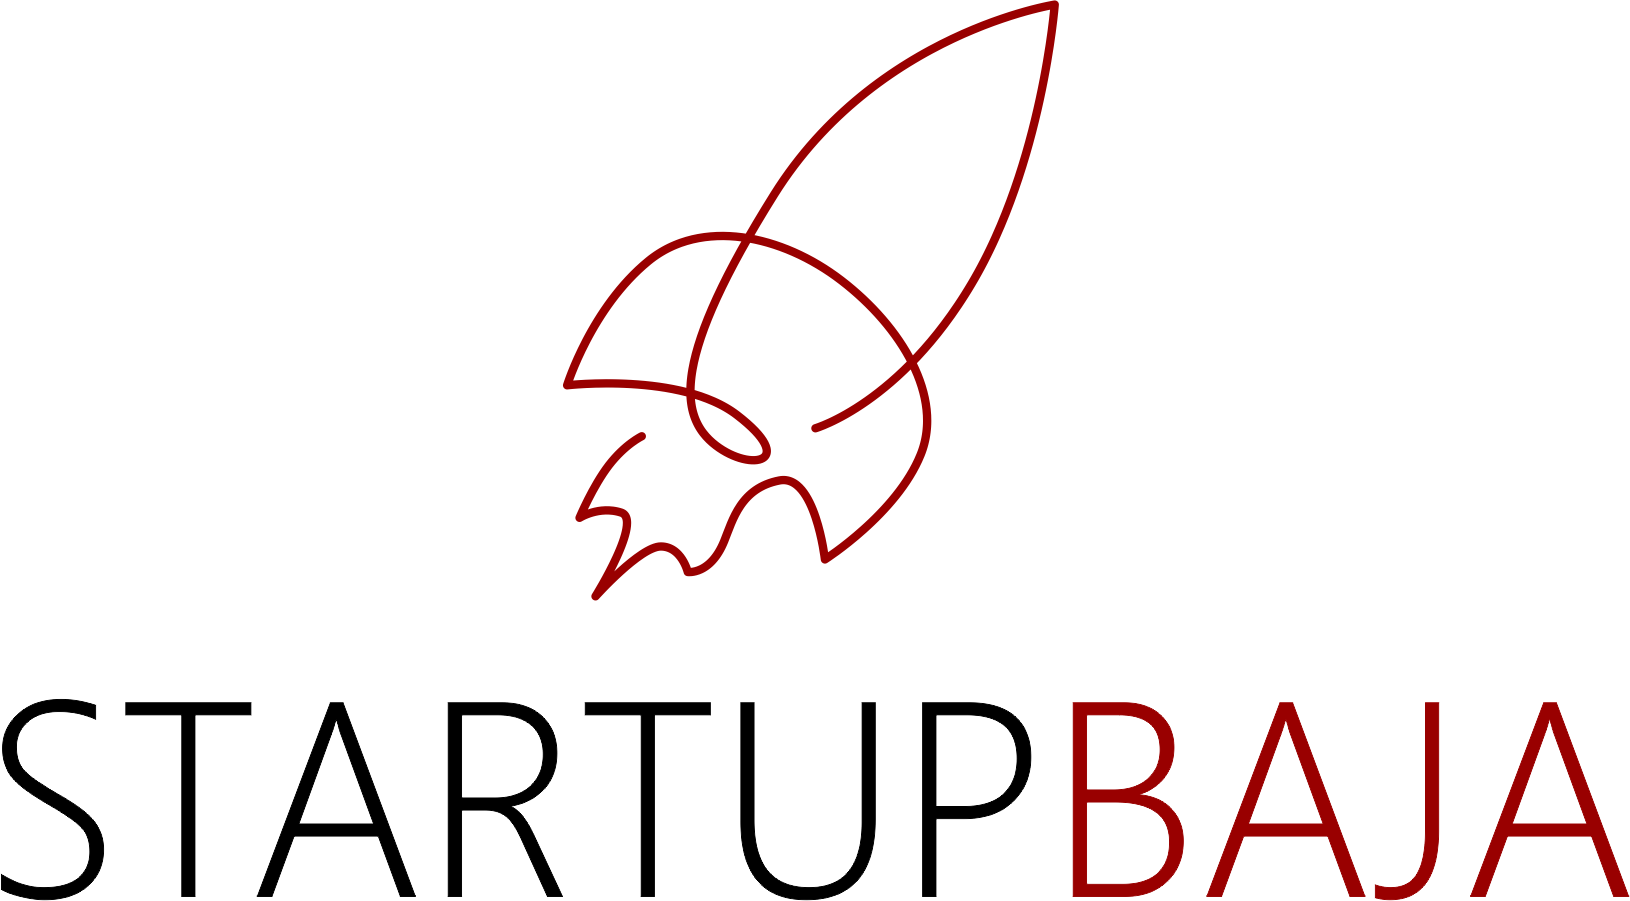 Startup Baja